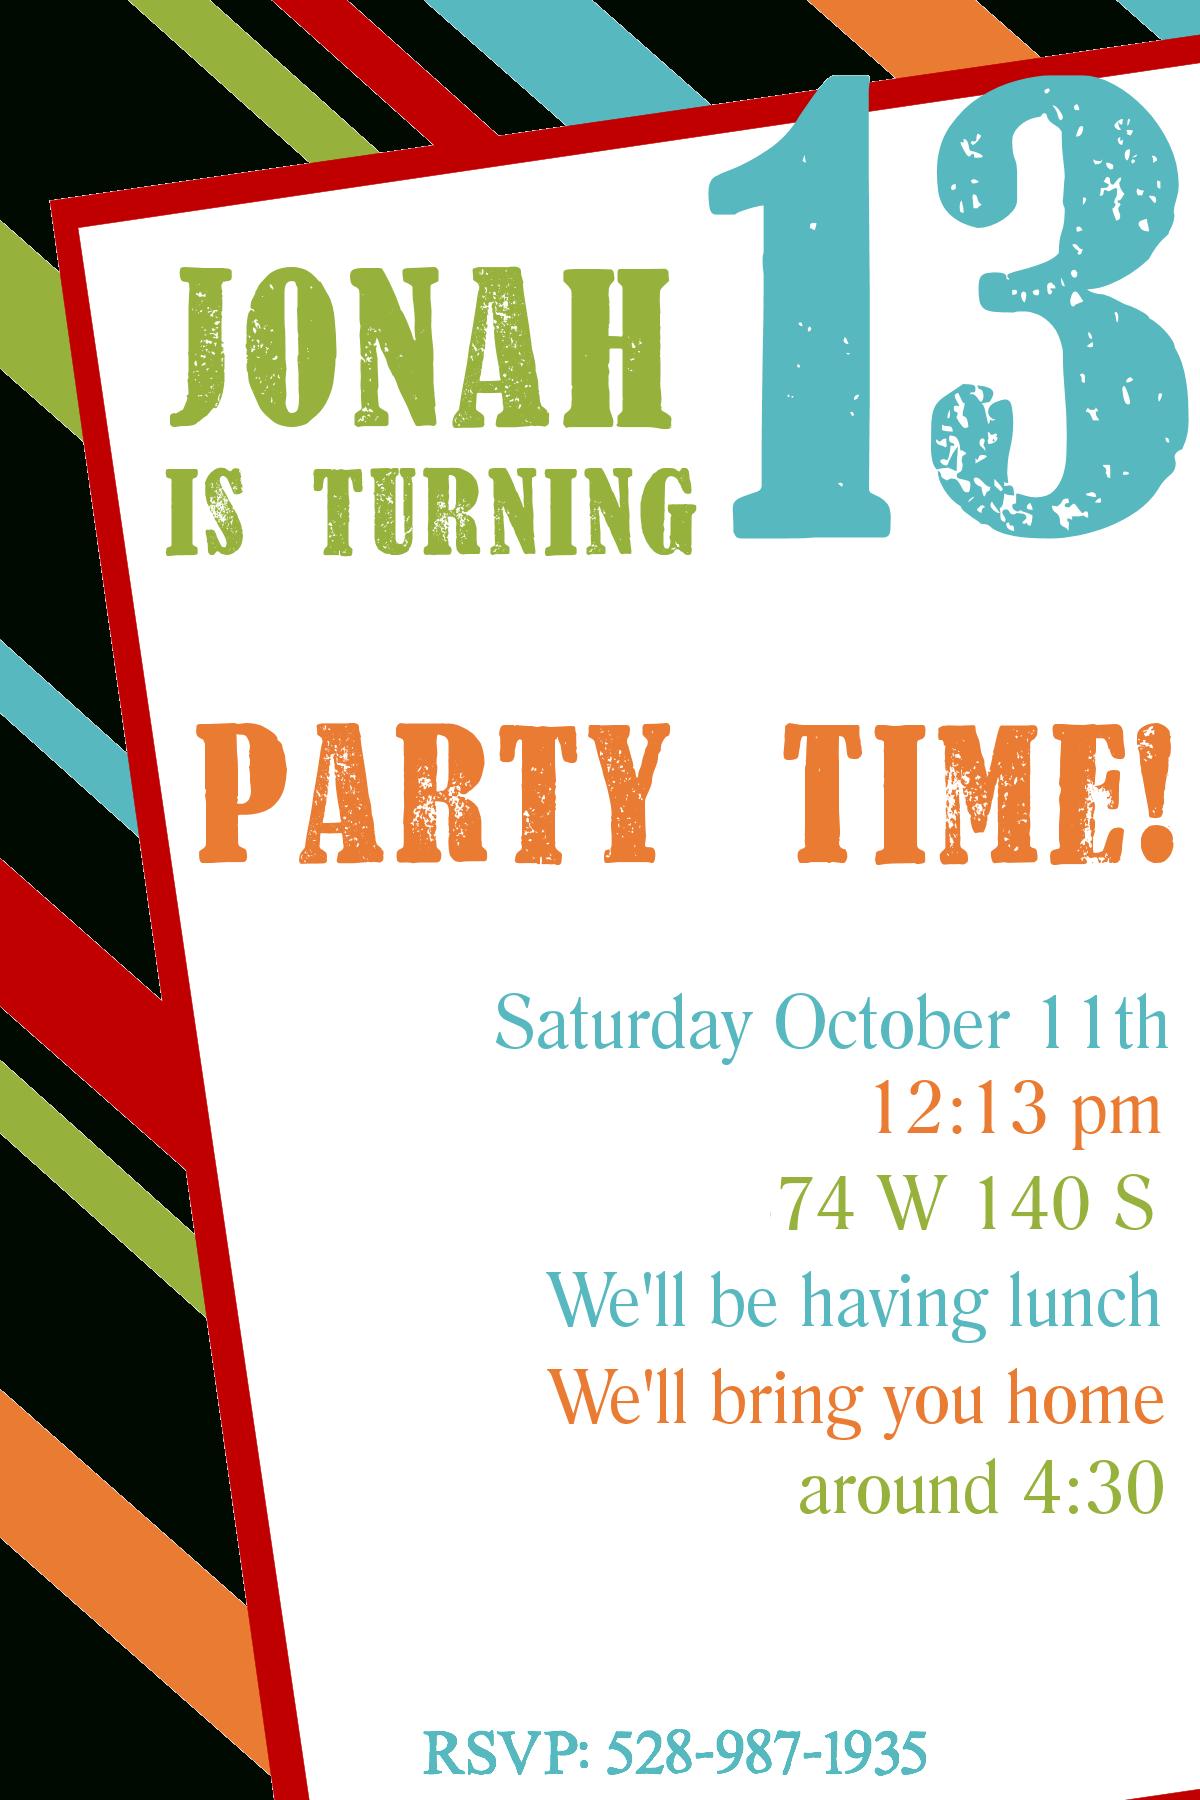 Free Printable Birthday Invitation Templates - Free Printable Birthday Invitations For Kids